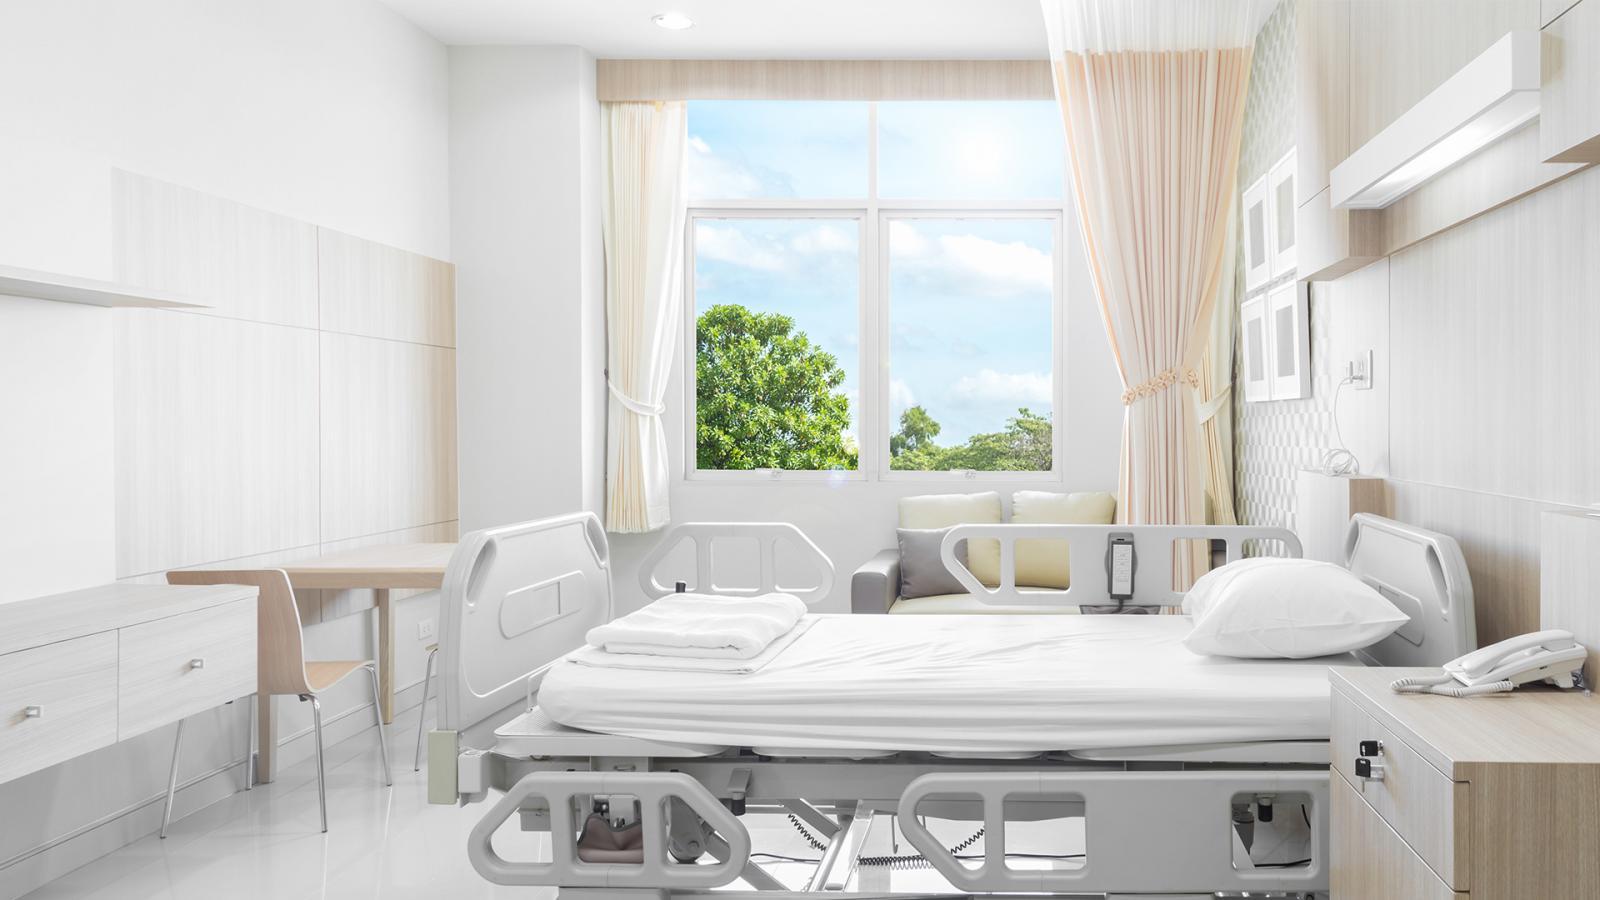 Hospital Segment